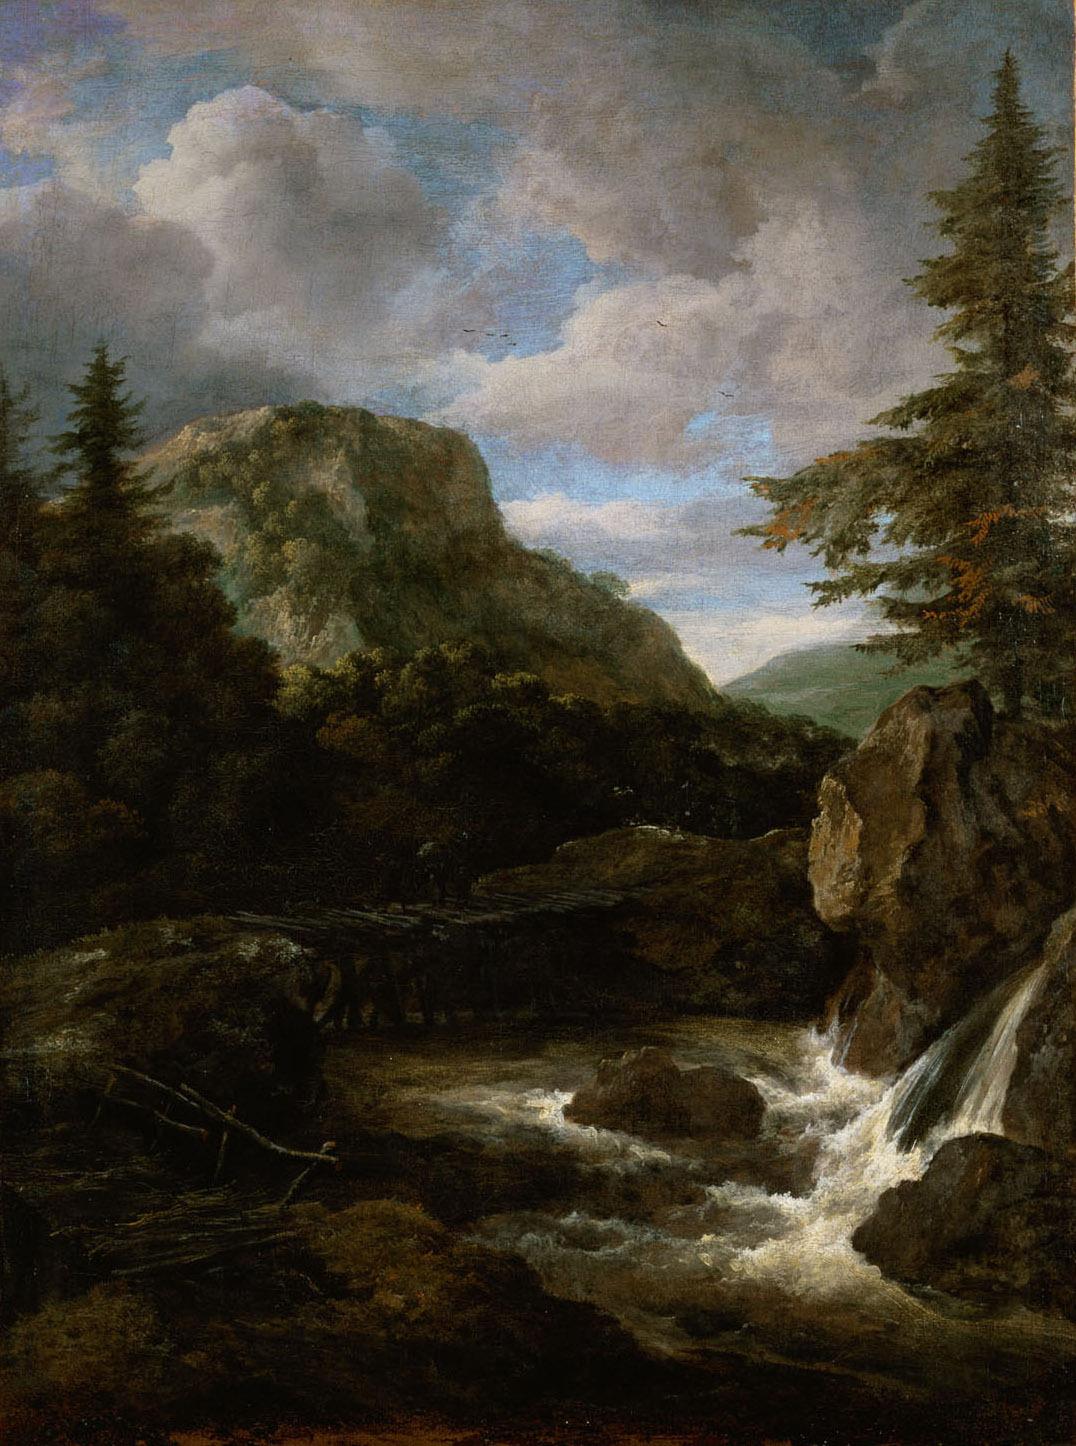 Berglandschaft mit Wasserfall von Jacob van Ruisdael